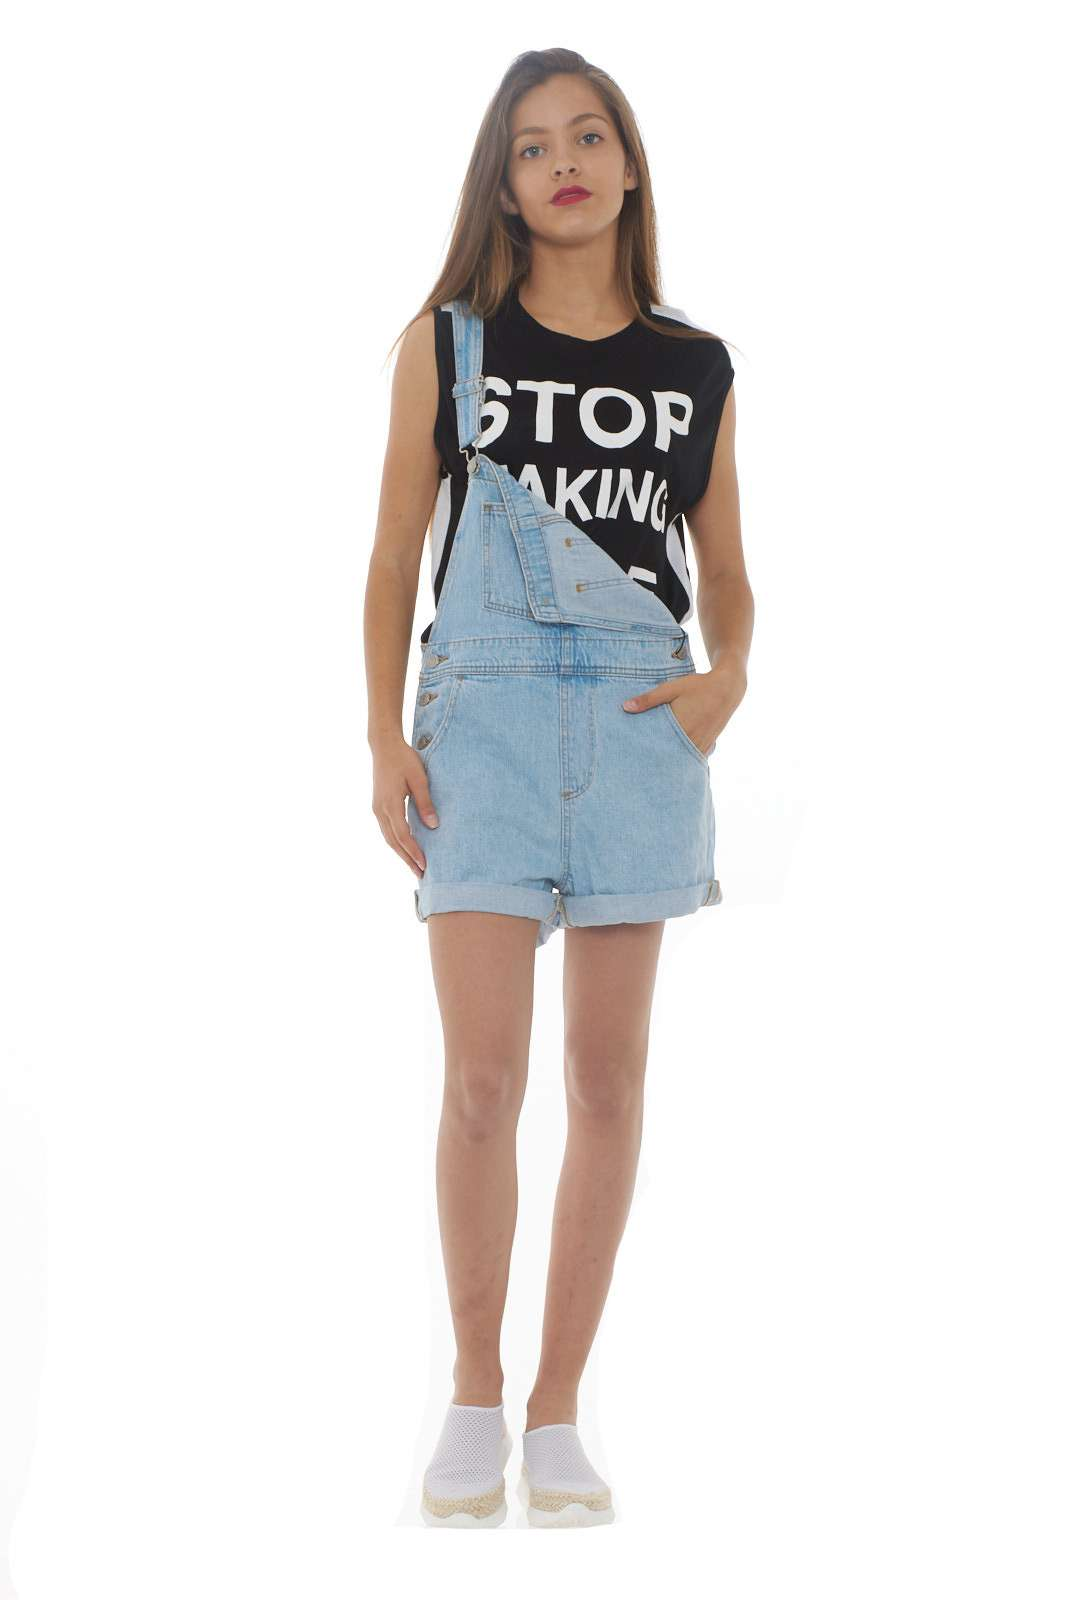 https://www.parmax.com/media/catalog/product/a/i/PE-outlet_parmax-t-shirt-donna-5Preview-U119-B.jpg